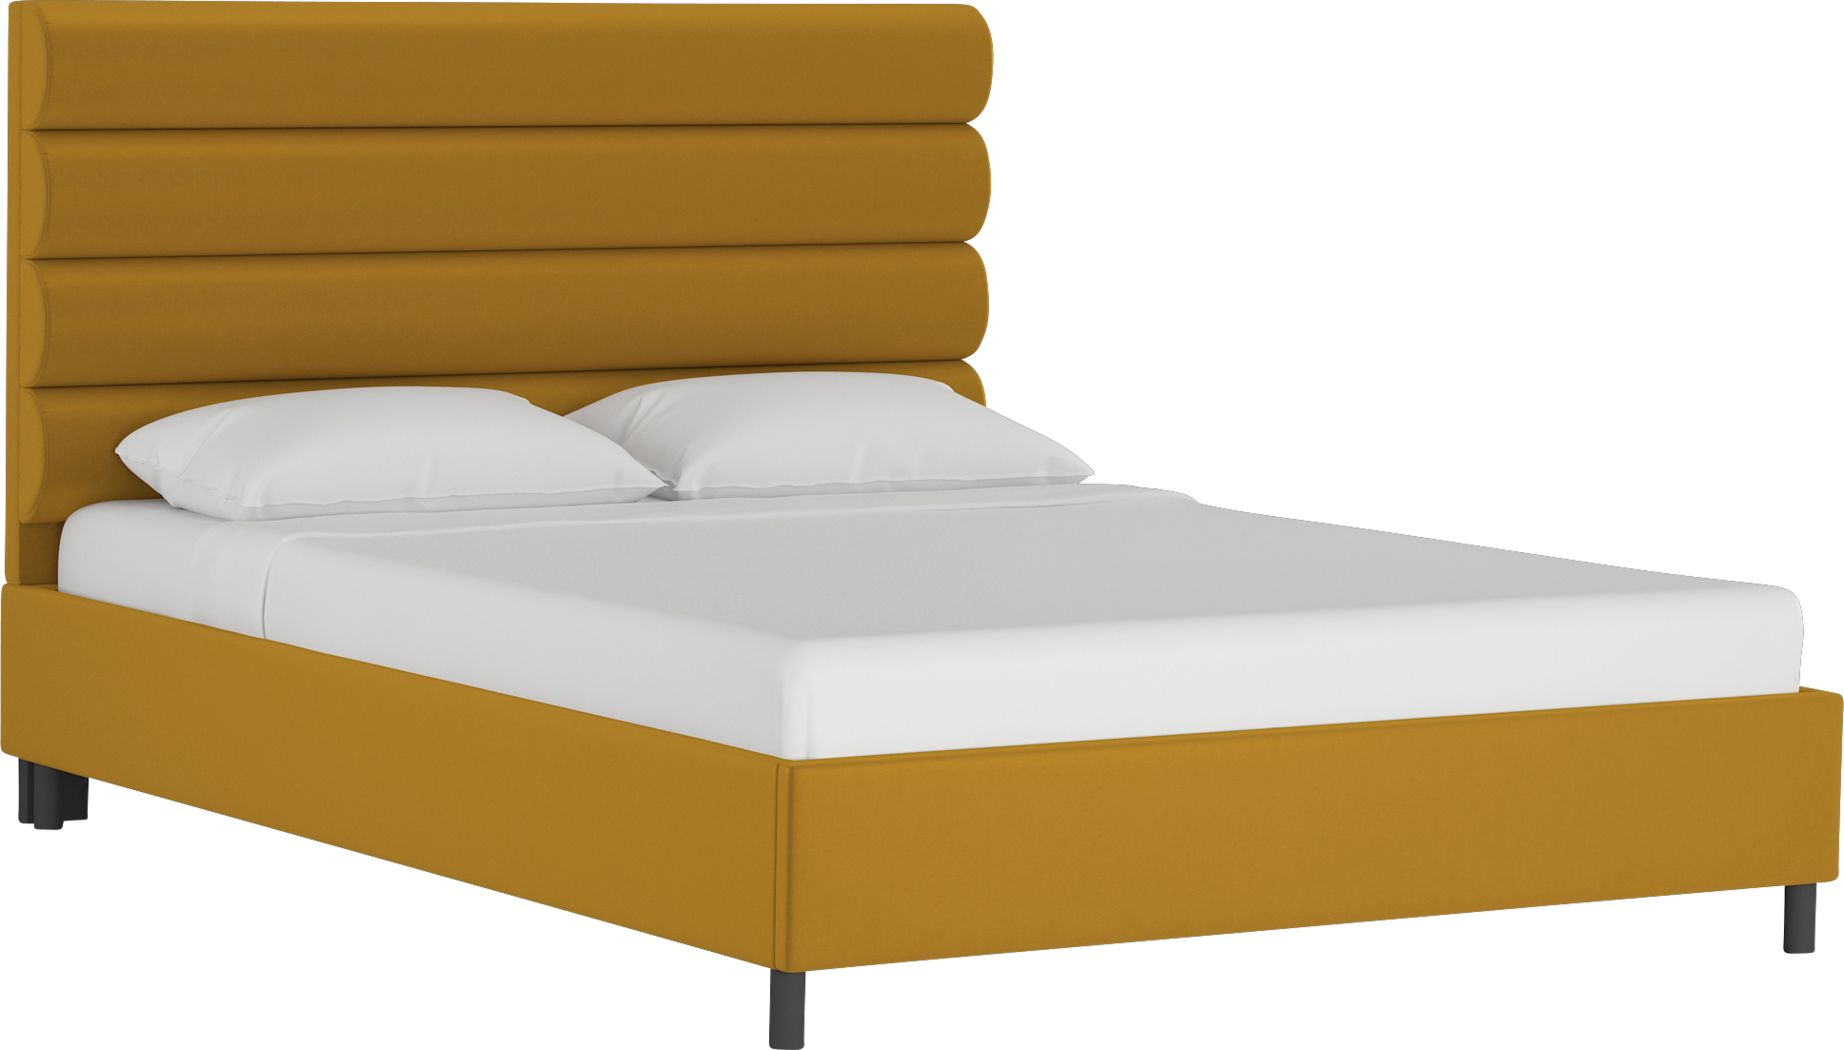 Kids Golden Rust Dijon Twin Upholstered Bed